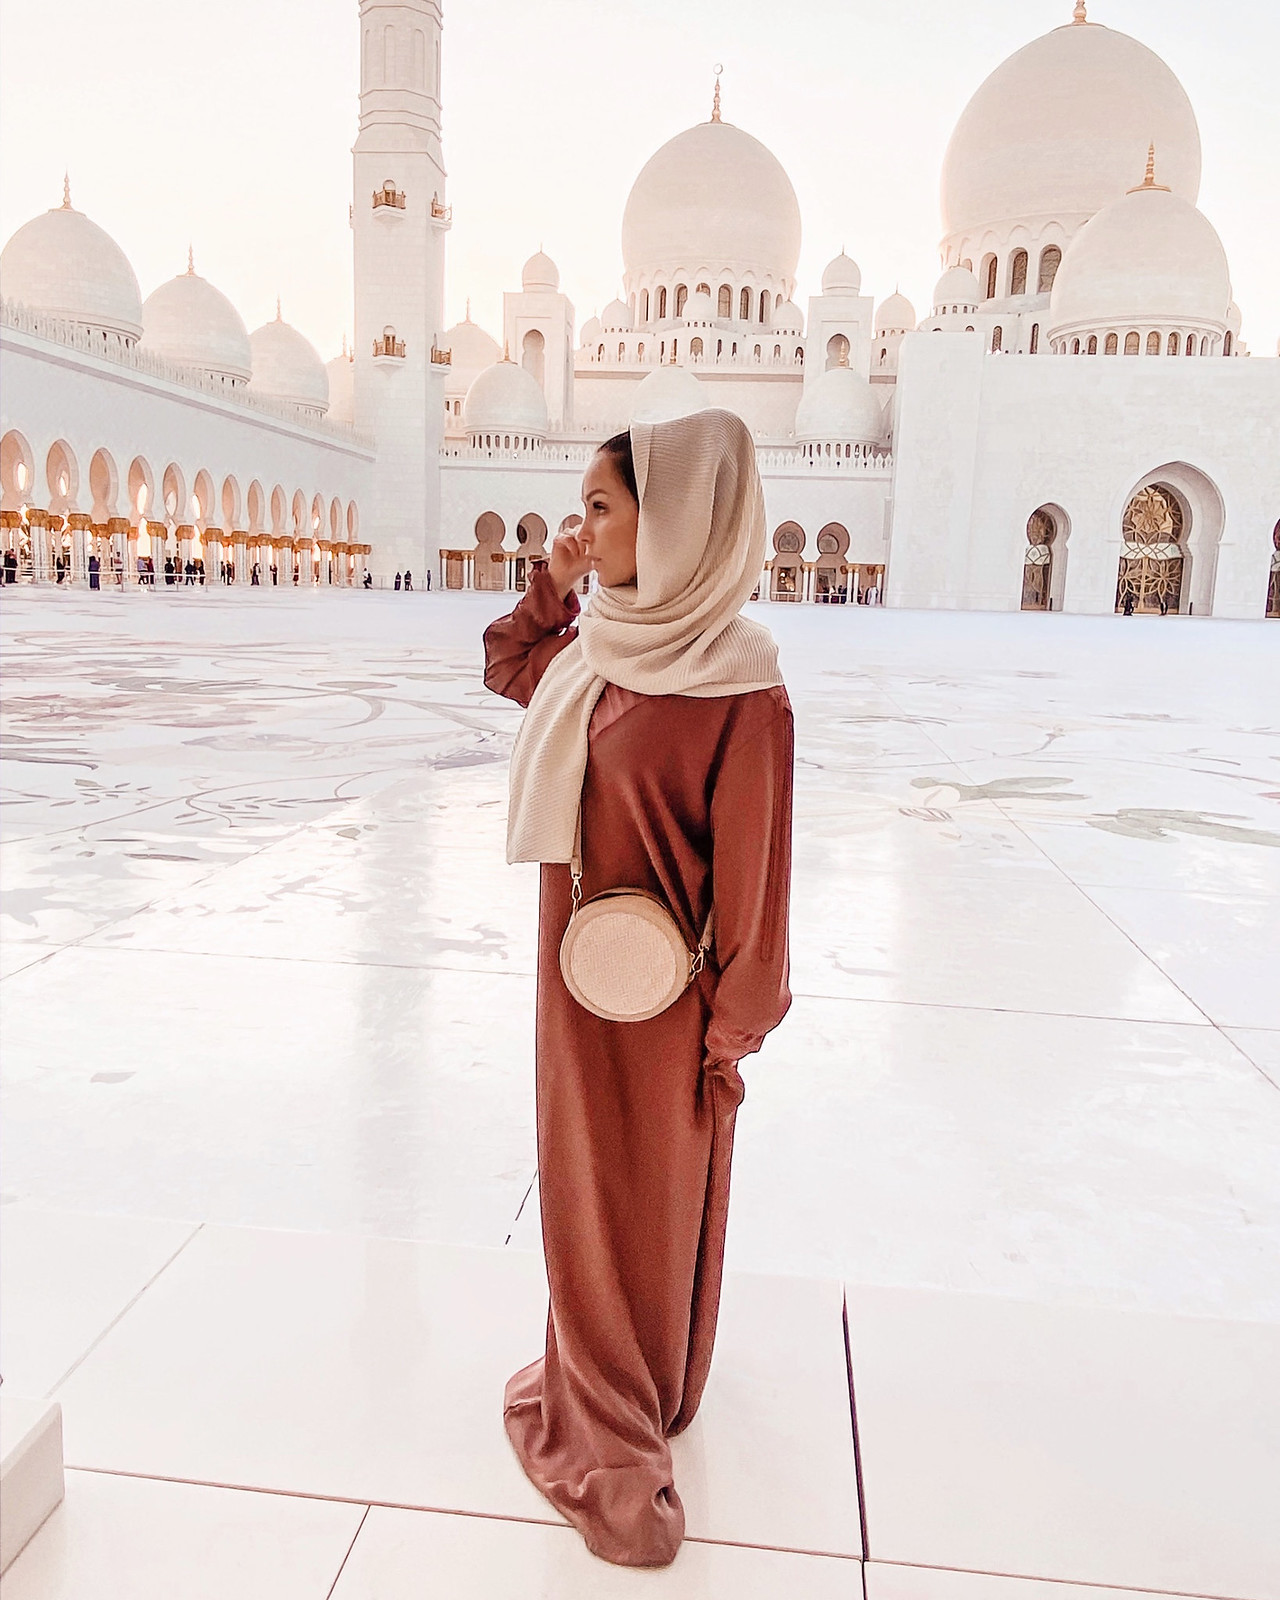 Abu Dhabi pukeutuminen